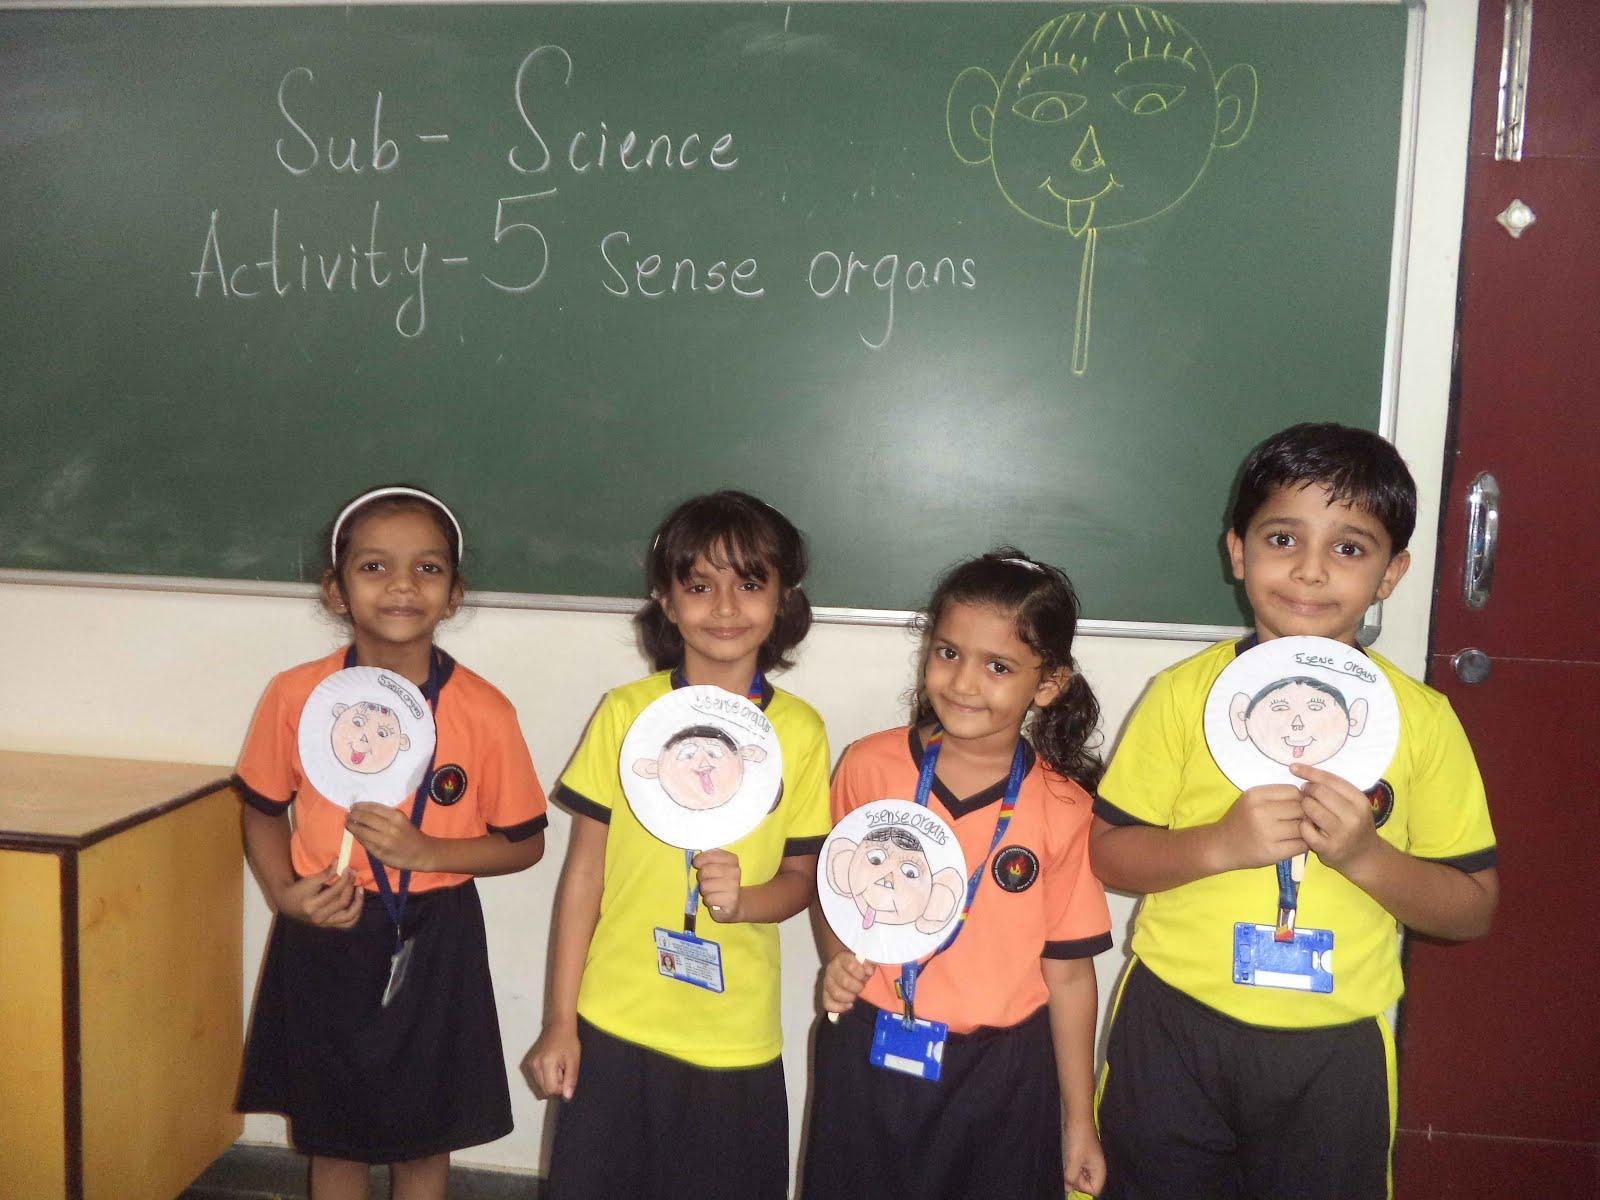 The Rustomjee Cambridge Diaries Science Activity Grade 1 Five Sense Organs